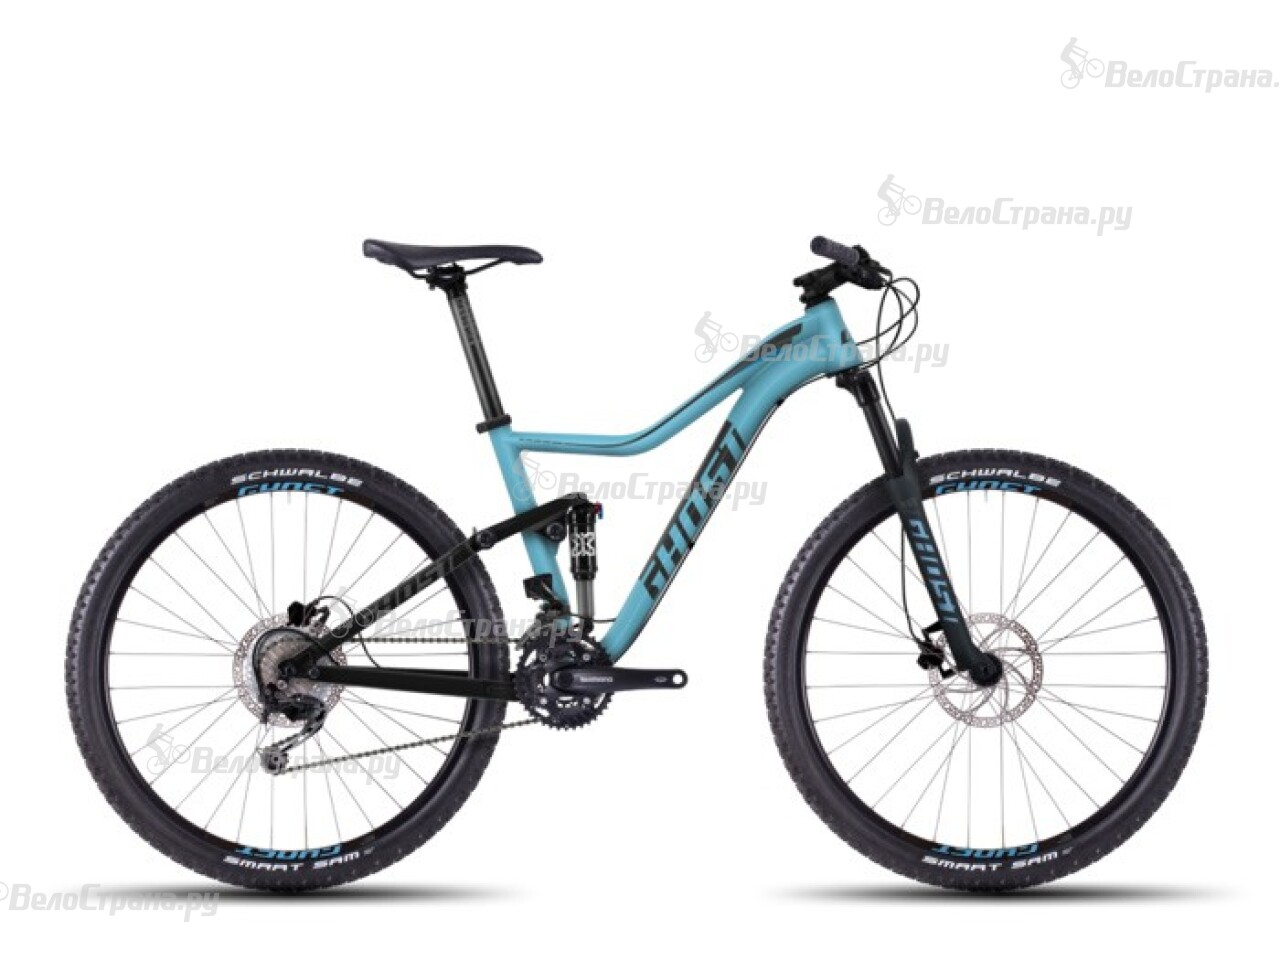 Велосипед Ghost Lanao FS 2 (2016)